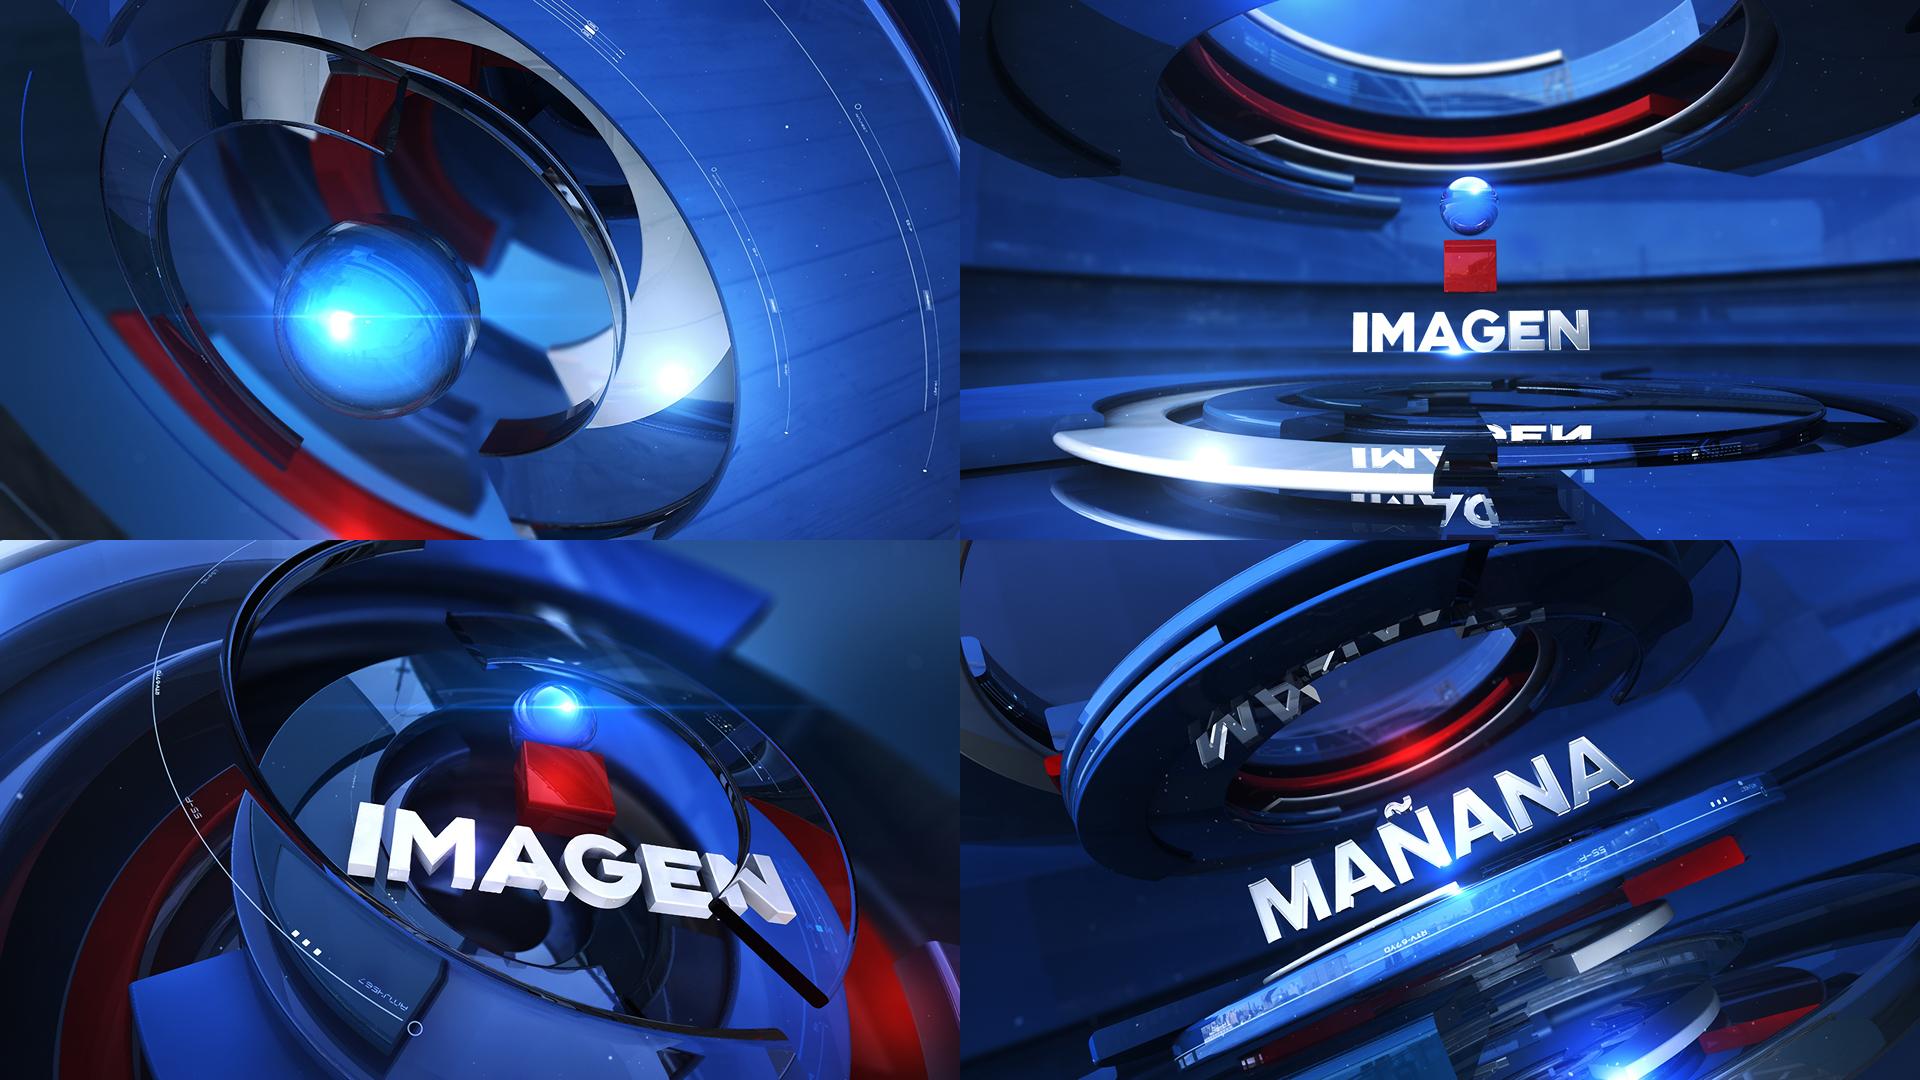 broadcast_design_grupo_imagen_mexico_news_titles_renderon_05.jpg